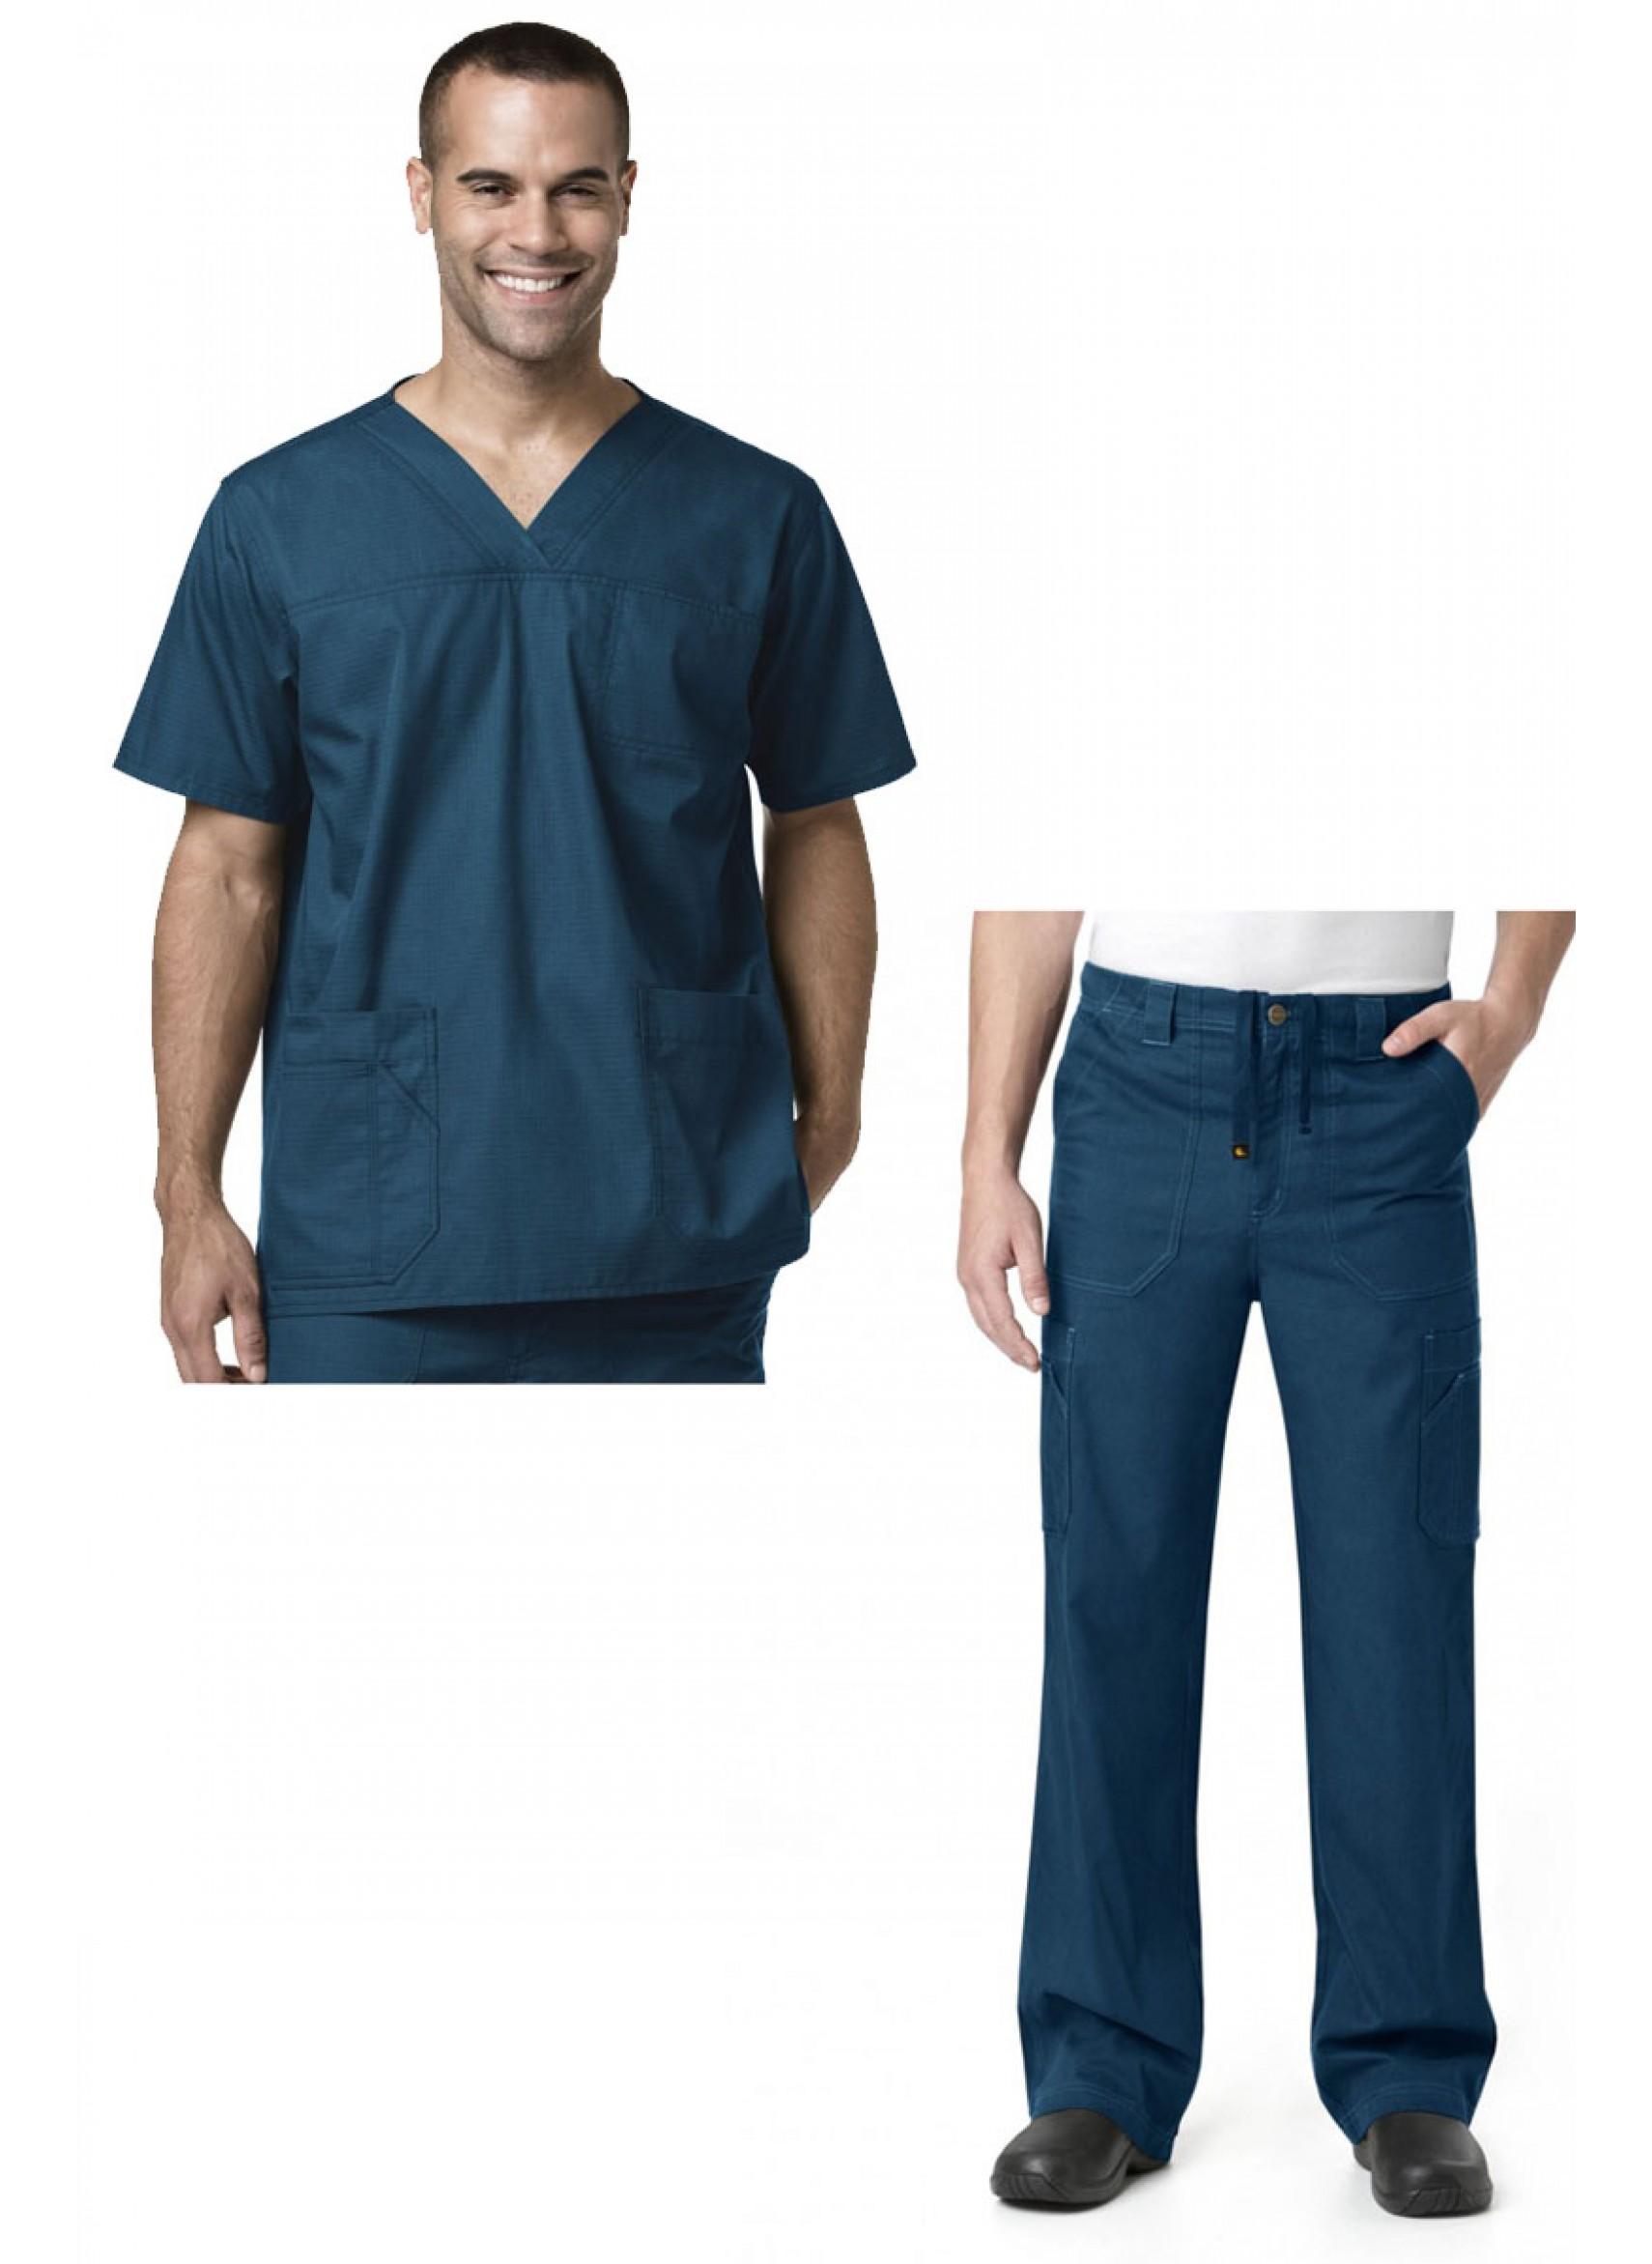 ebbac716b99 20% off all Dickies Scrubs! Use code DICKIES20 at checkout! Carhartt  C15208/C54108 Men's Ripstop 3-Pocket ...